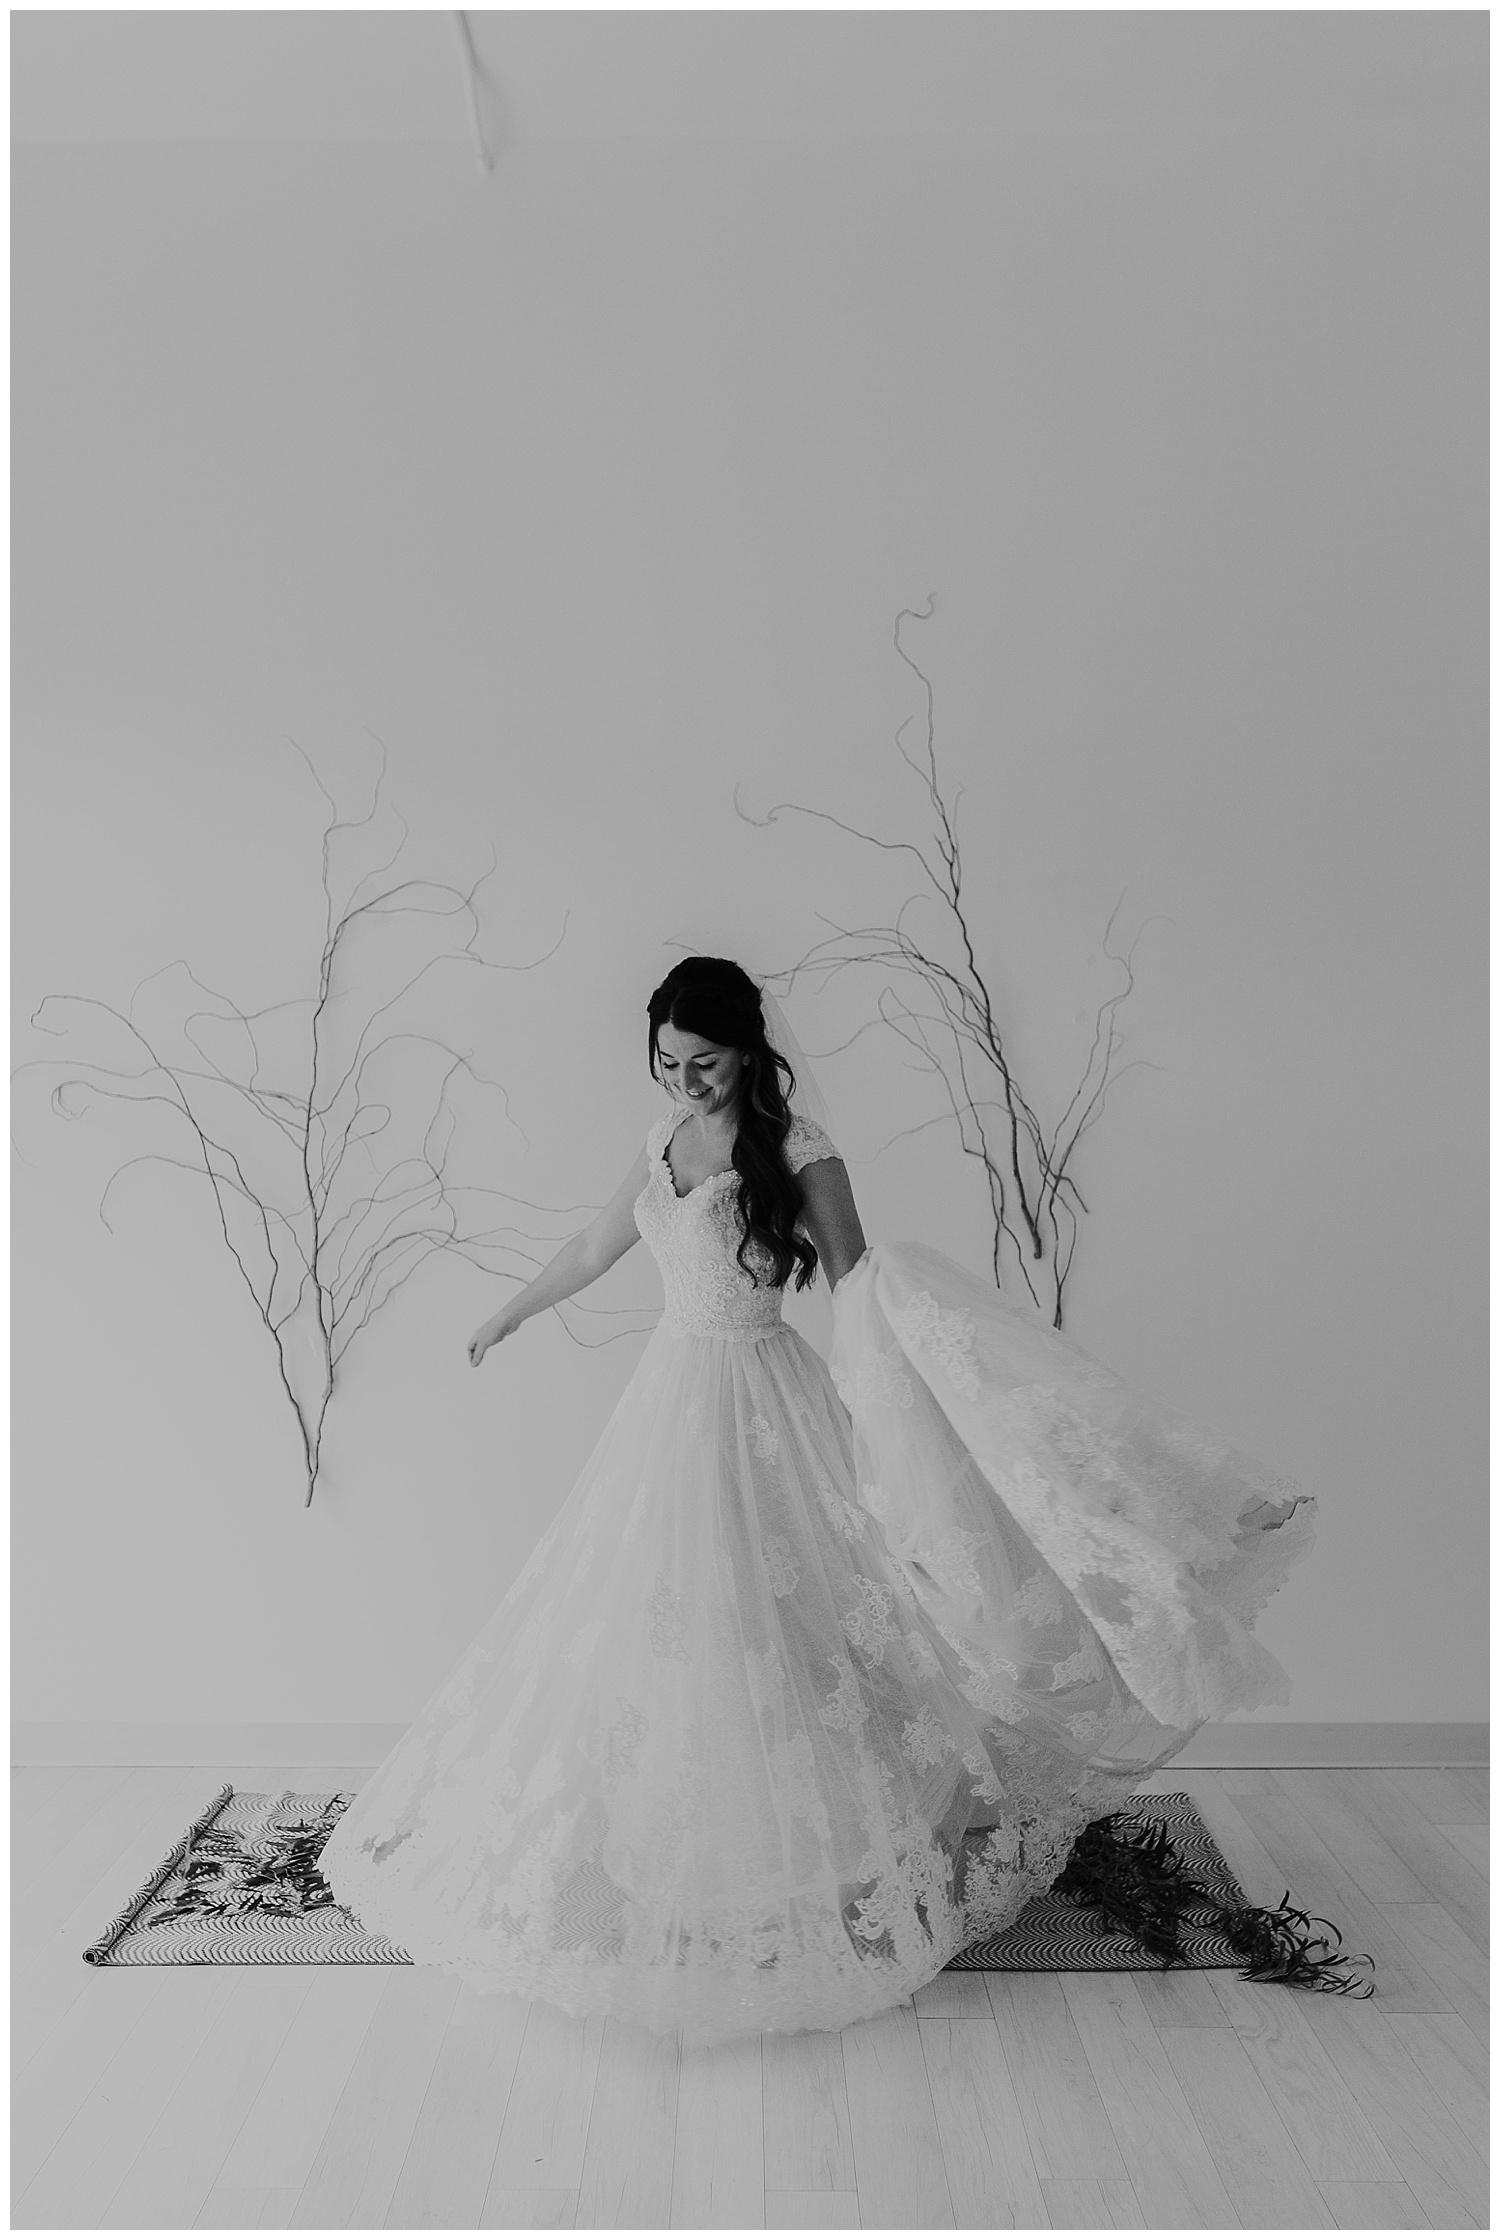 Laken-Mackenzie-Photography-Lumen-Room-Fort-Worth-Bridal-Session-Fort-Worth-Photographer10.jpg